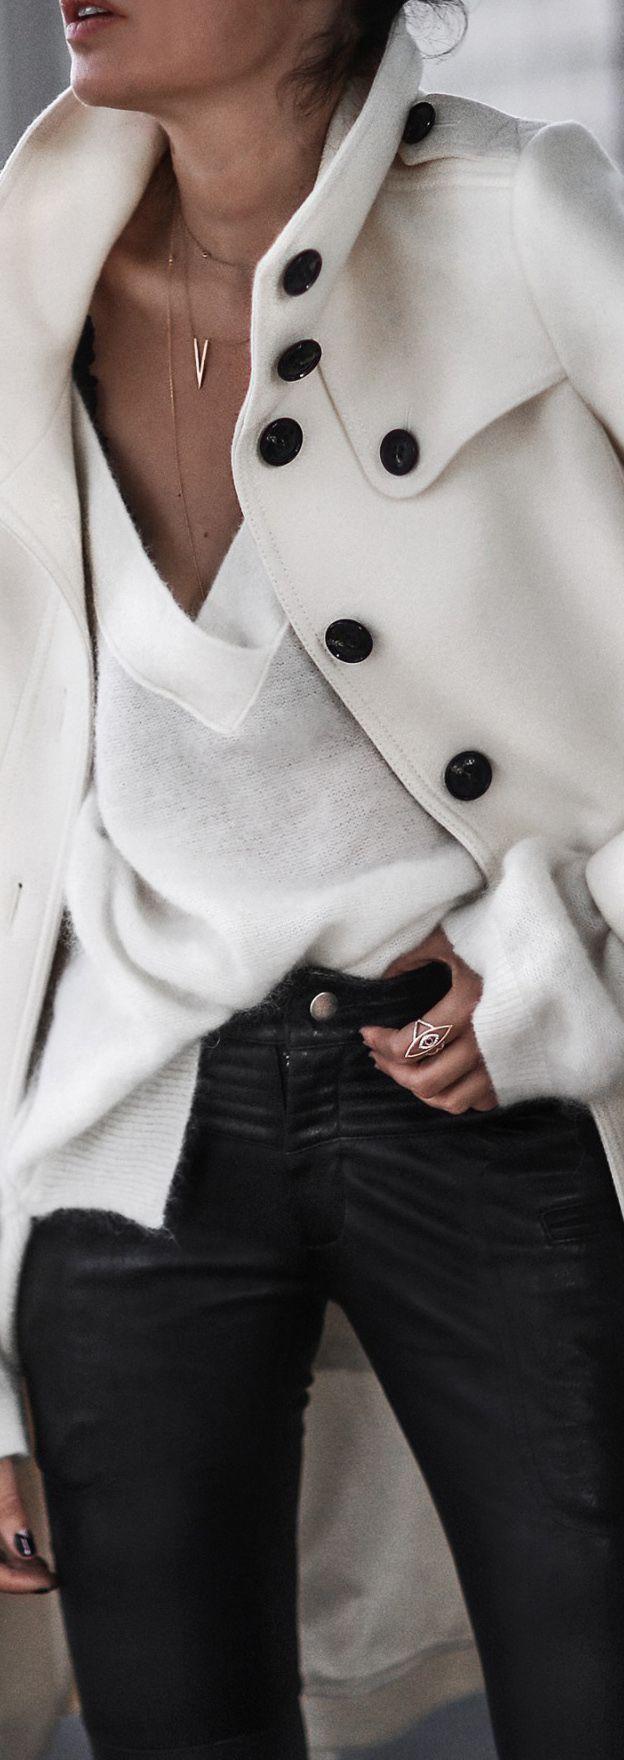 2017 Fashion Trends Anziehsachen Stil mode Mode style